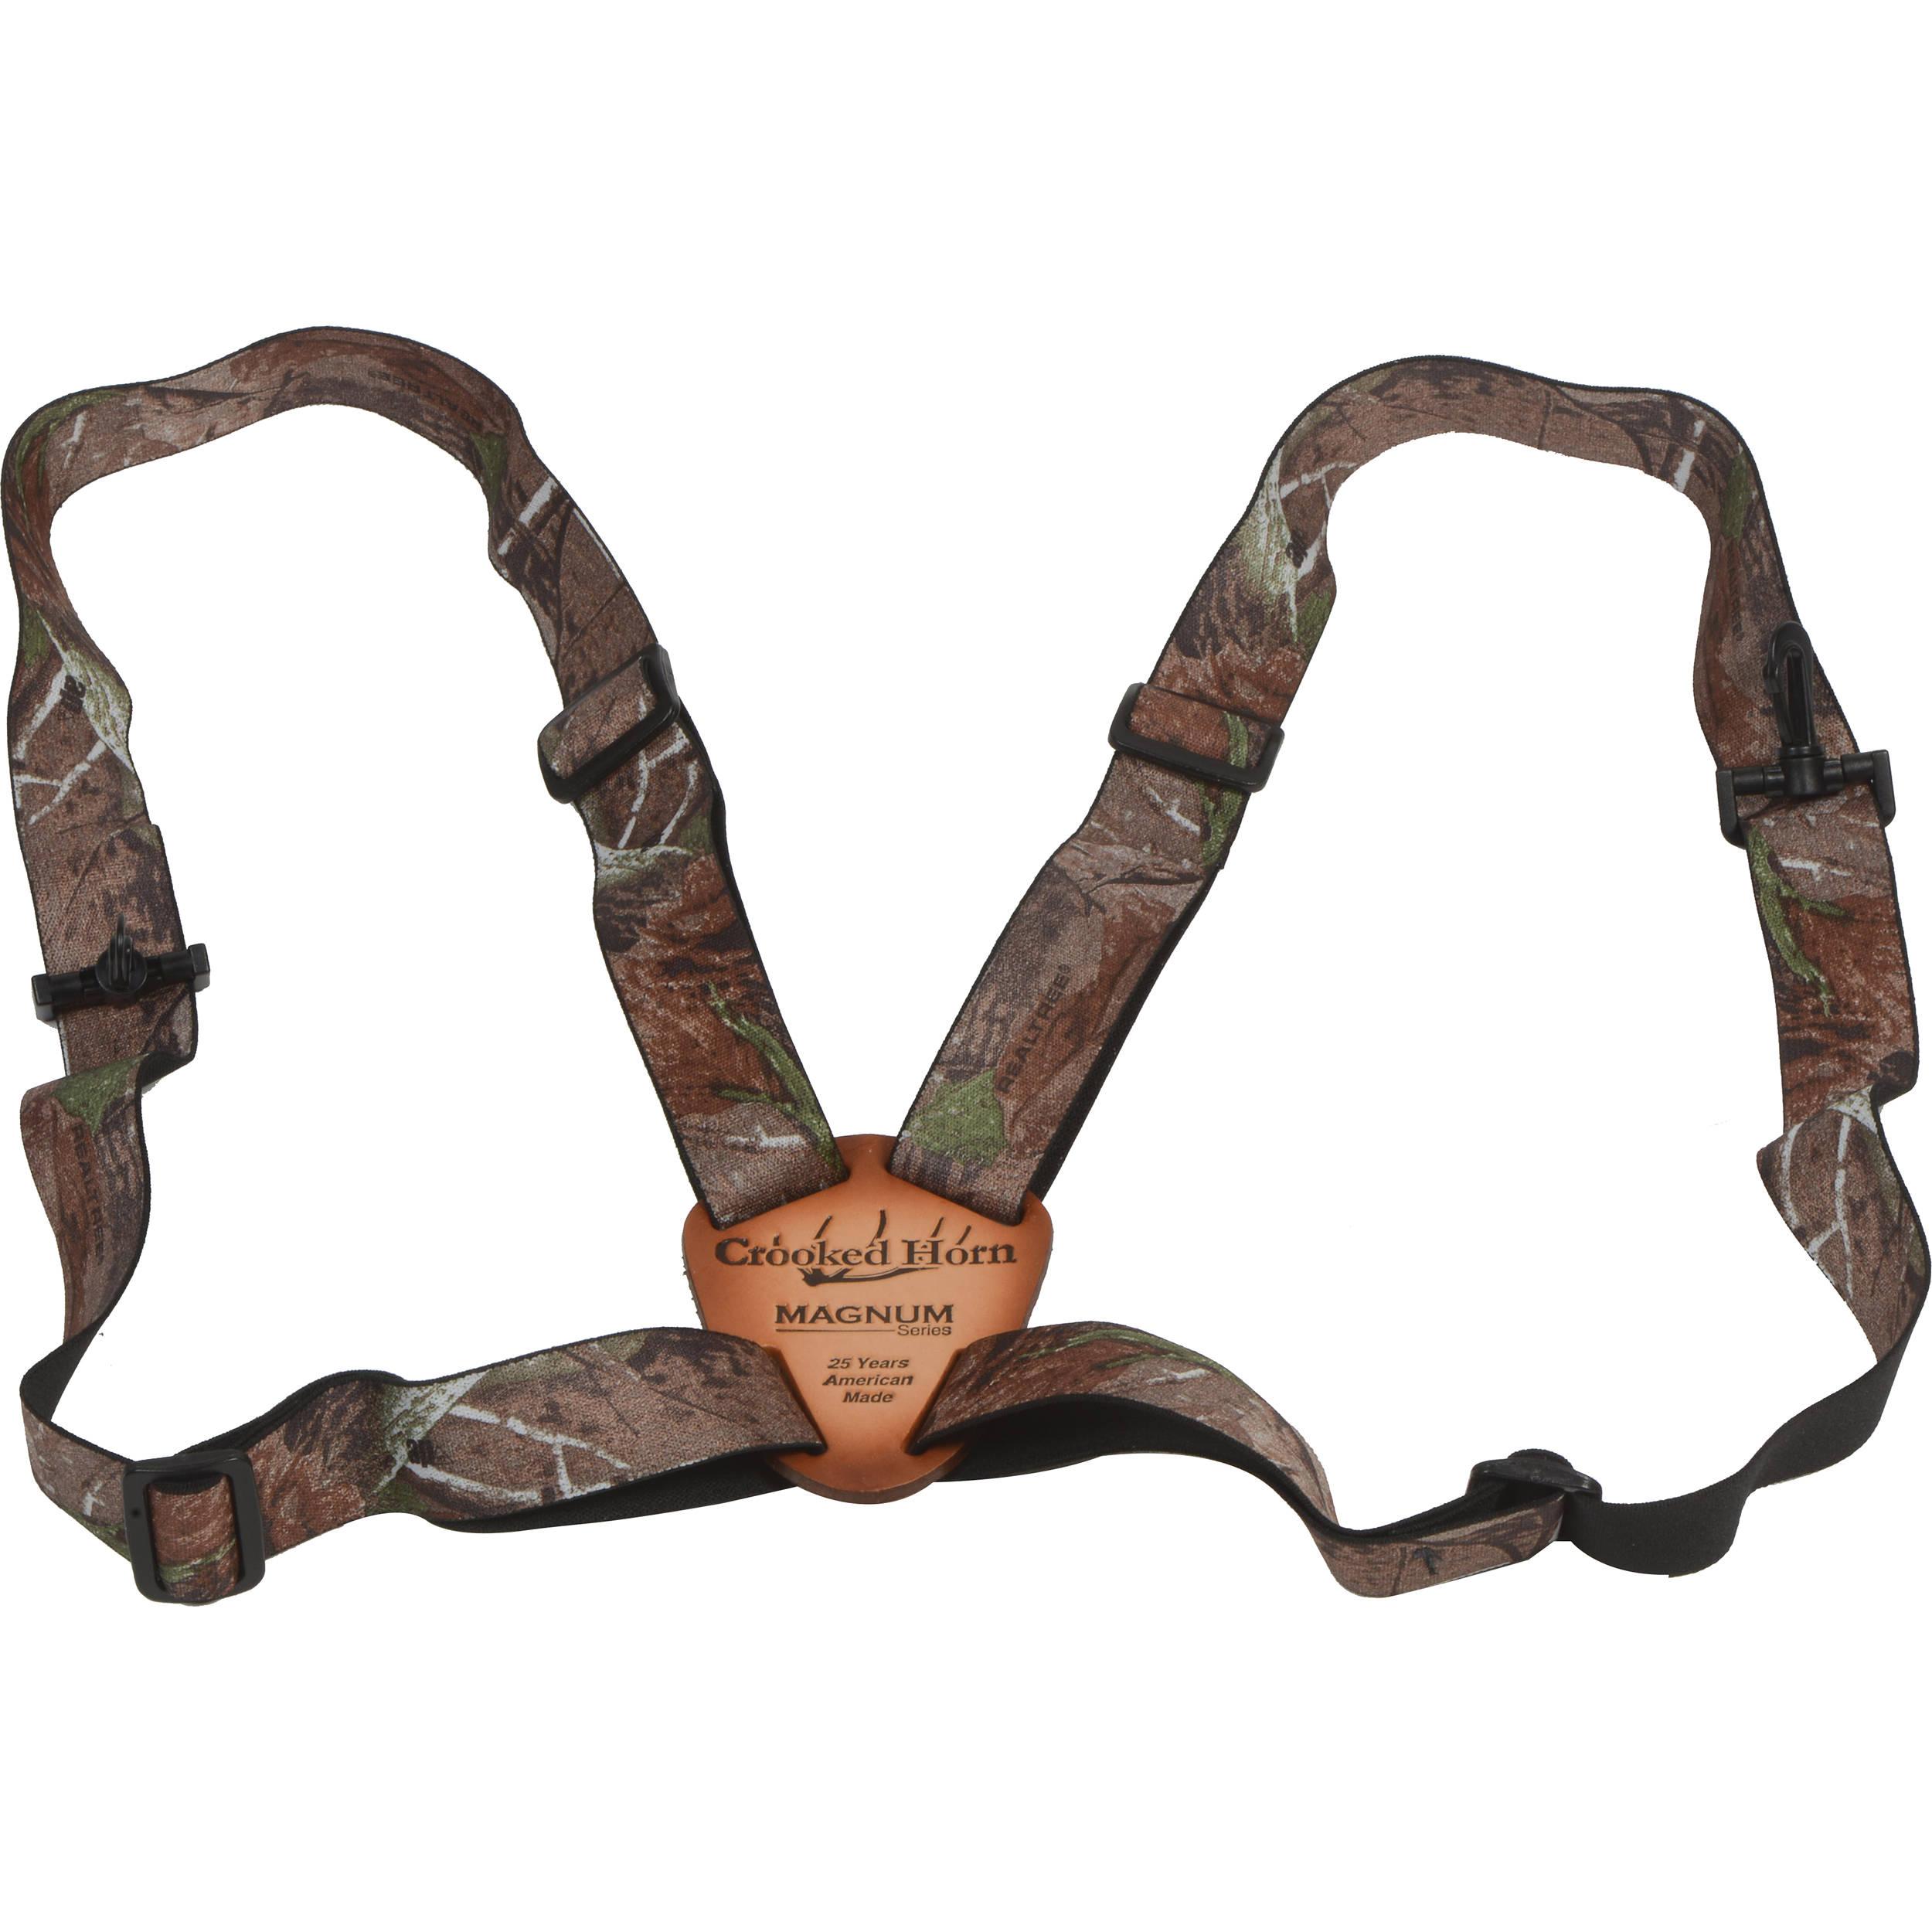 Bino System Binocular Harness Wire Center Dayton 22846c Wiring Digram Crooked Horn Outfitters Magnum Bs 128 Rh Bhphotovideo Com Best Vortex